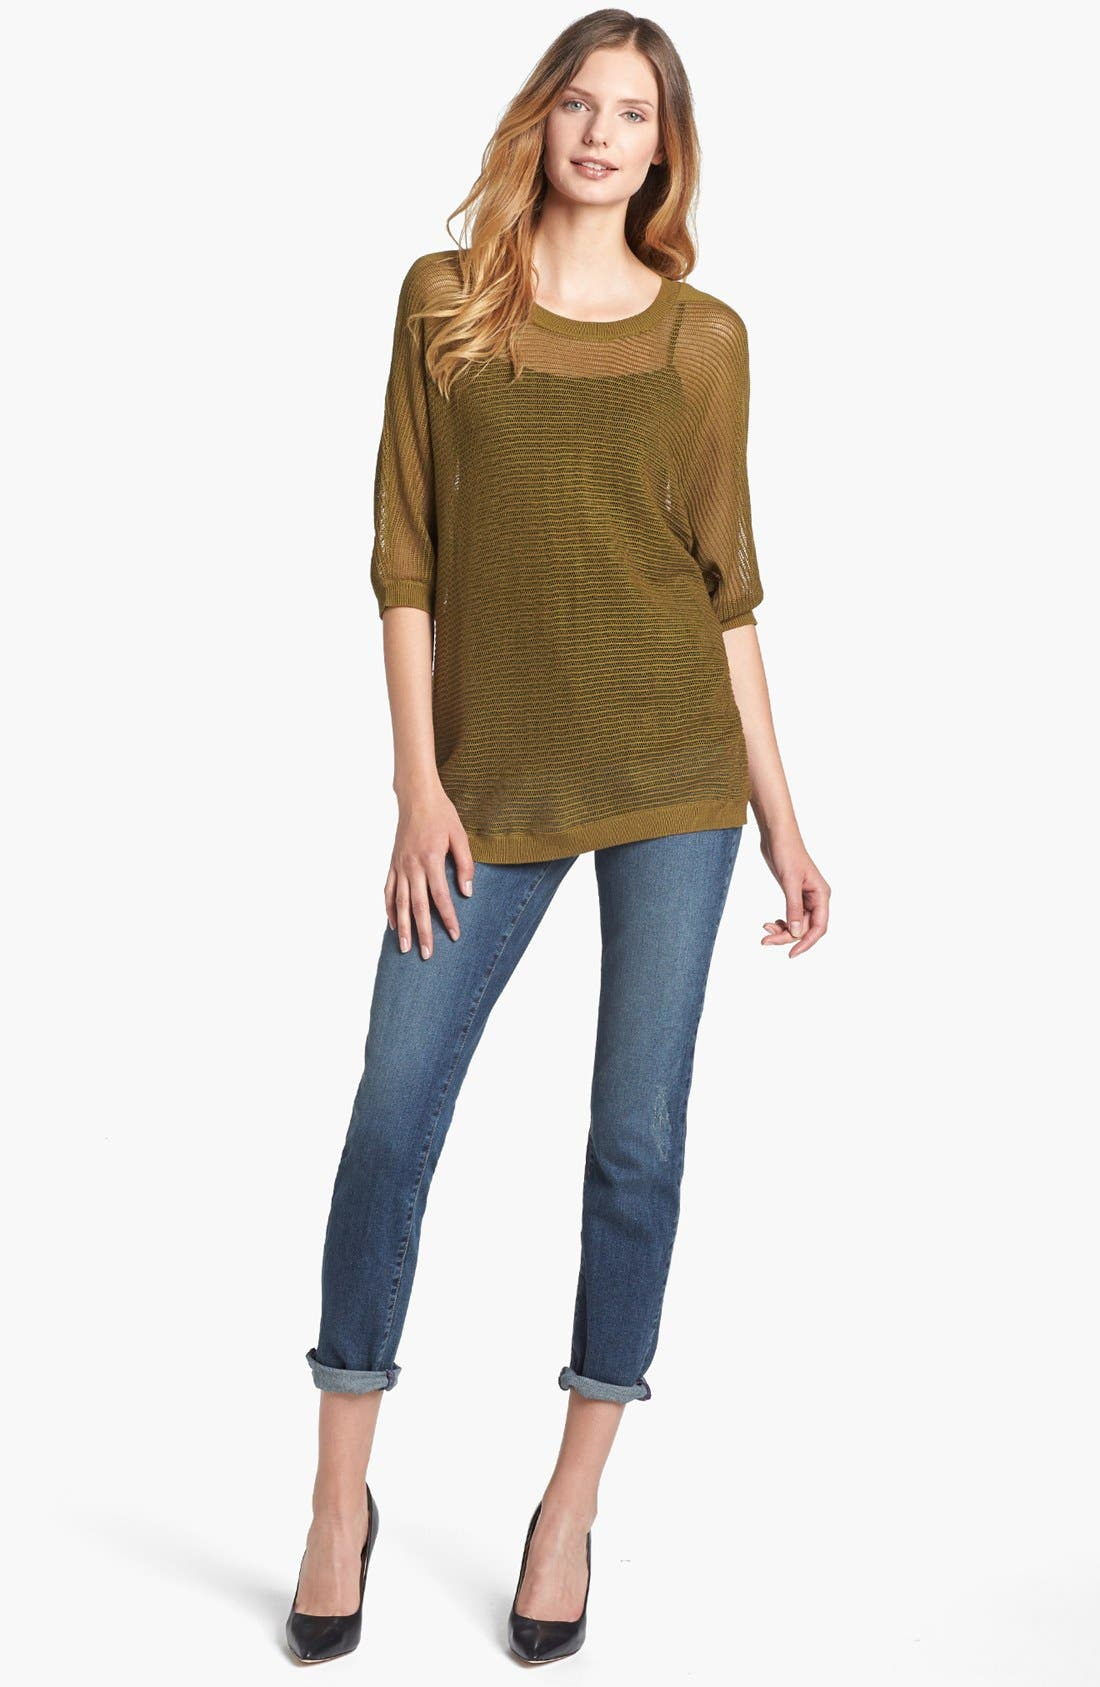 Main Image - NYDJ 'Leann' Stretch Skinny Boyfriend Jeans (Loma Linda)